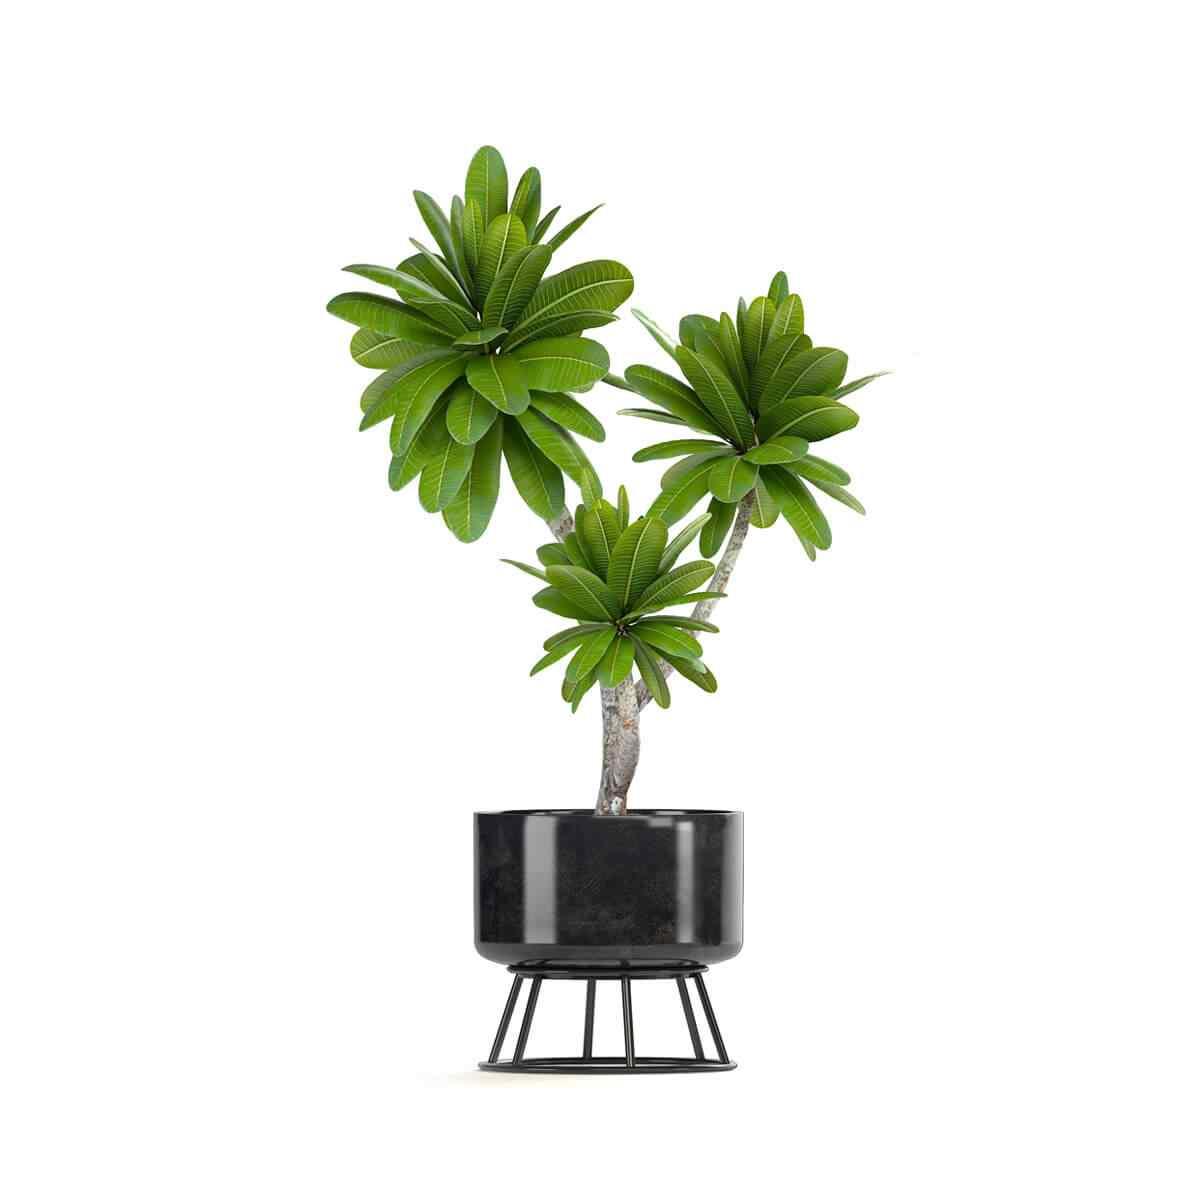 http://greenshade.com.au/wp-content/uploads/2018/09/product_08.jpg